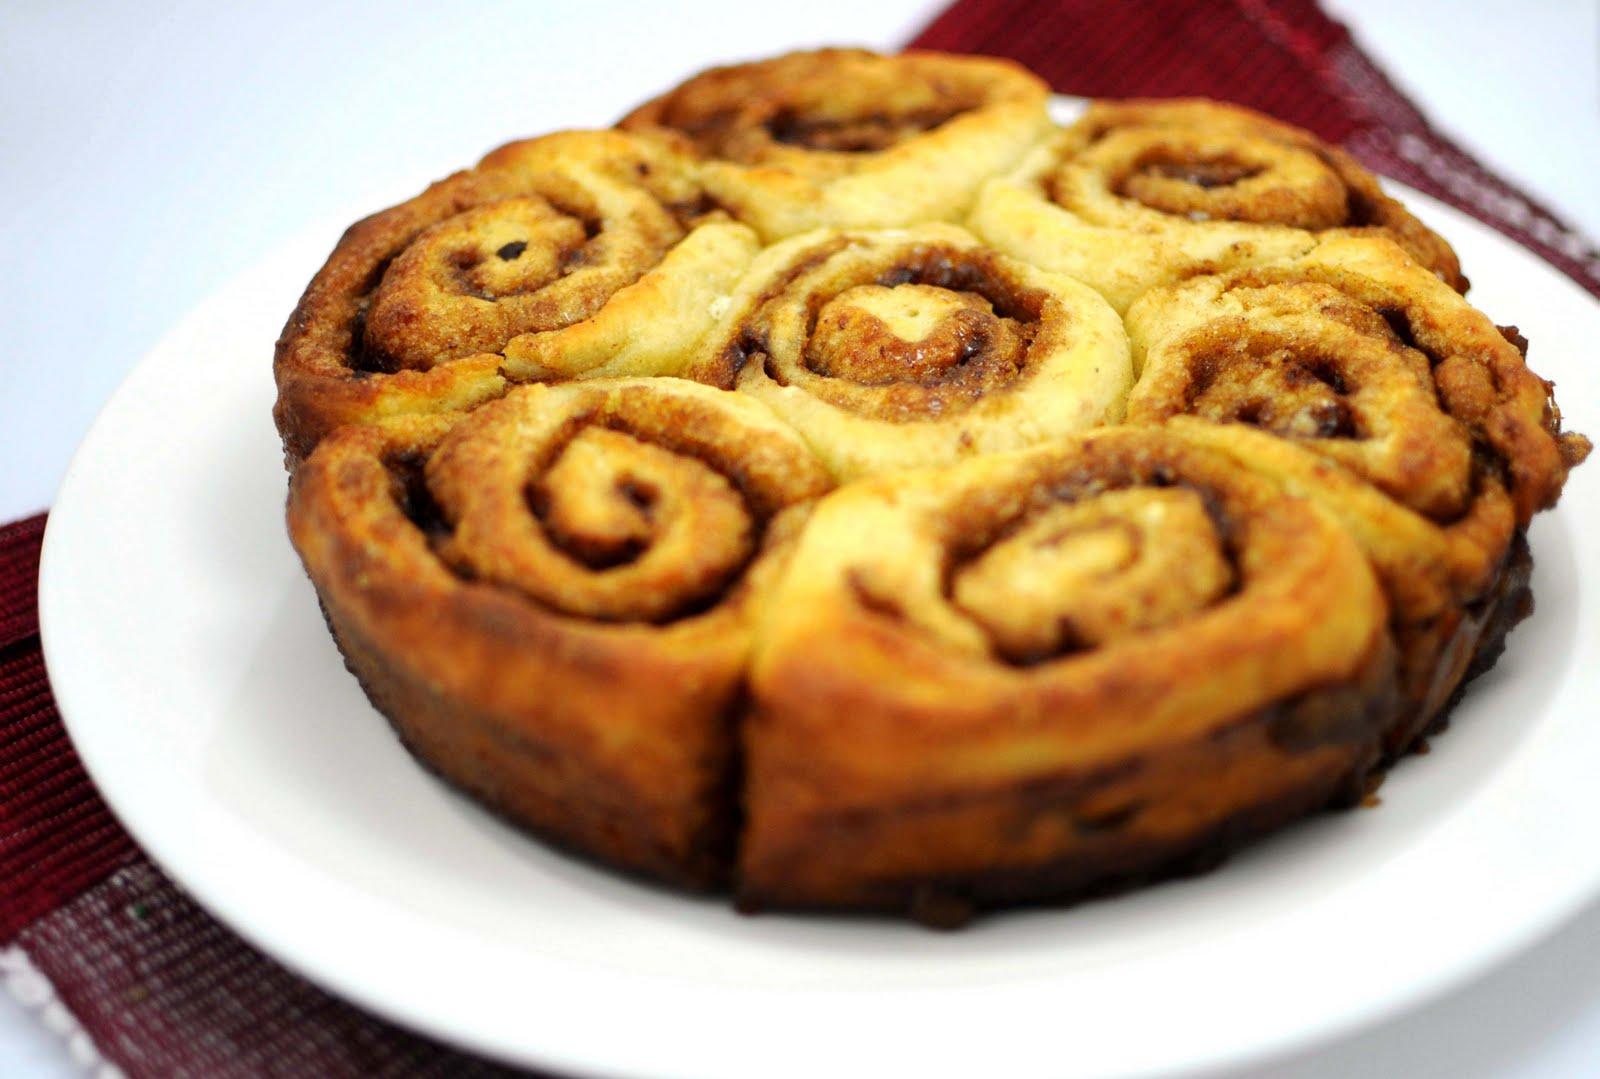 Sweet make me Smile ..: Fastest Cinnamon Buns, for real!